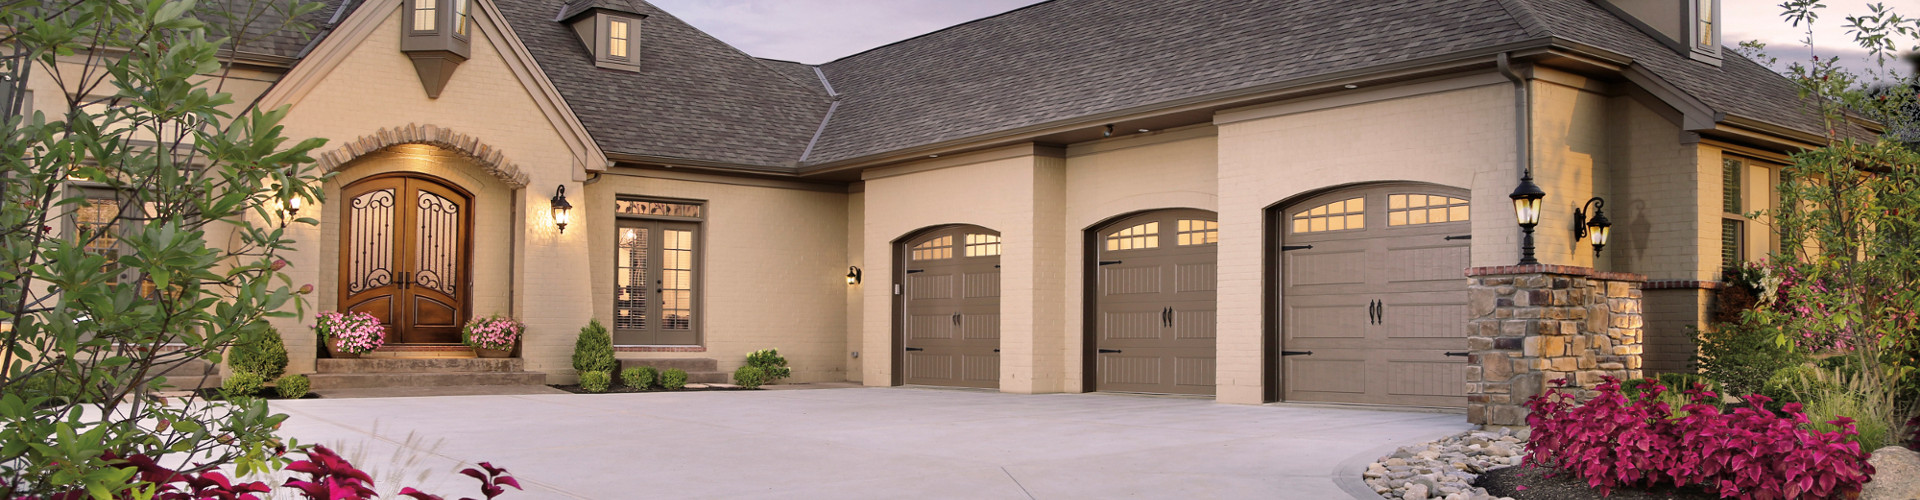 Custom Garage Doors in Salt Lake City